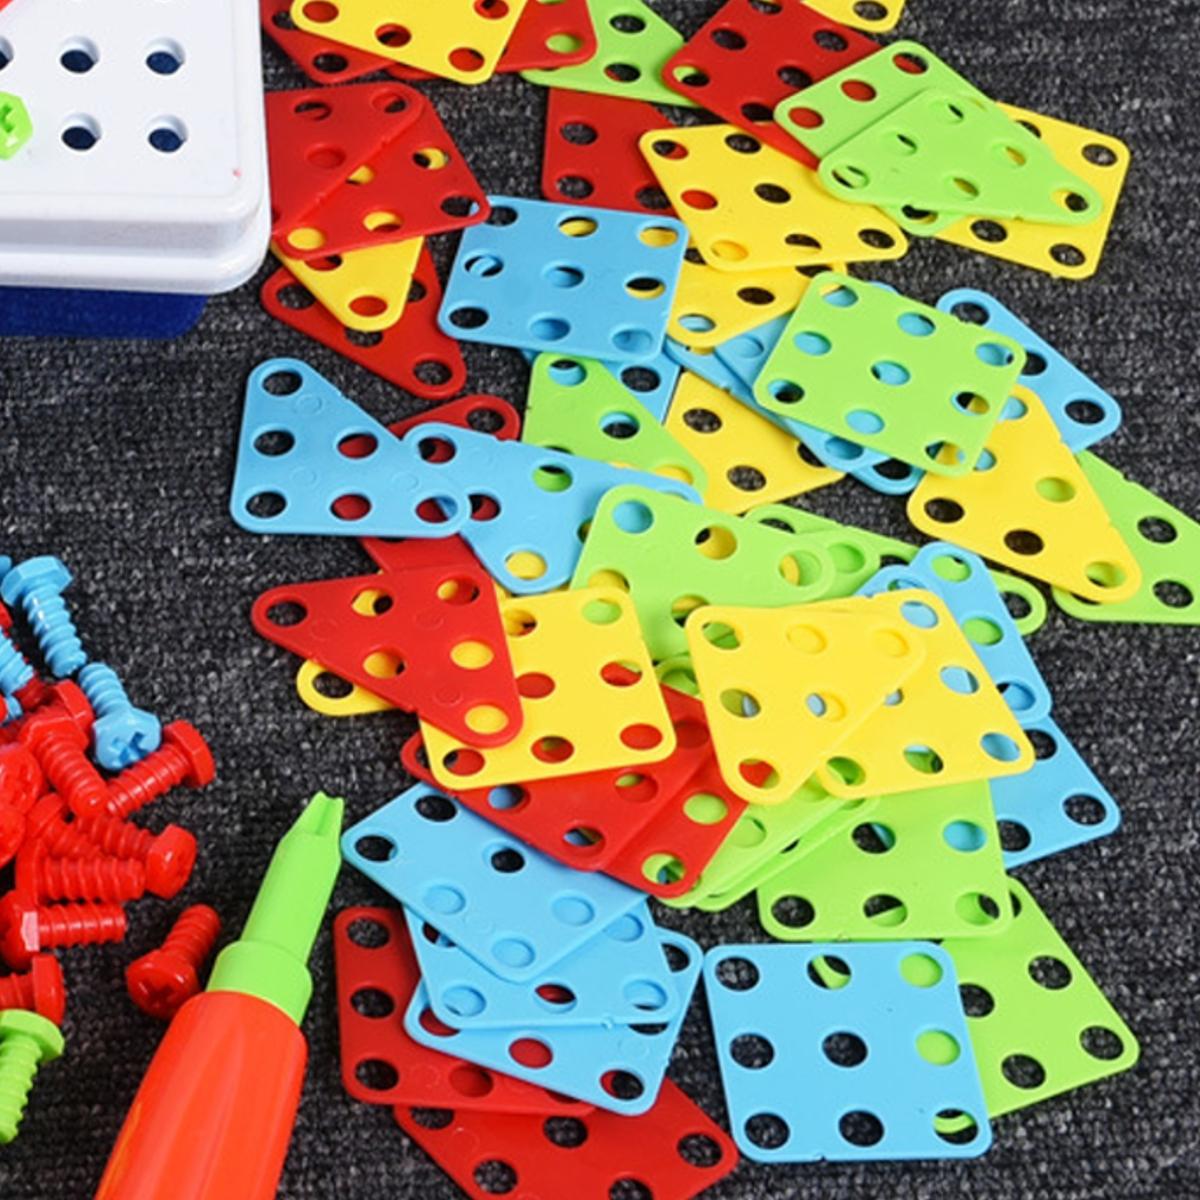 237 Pcs Creative Mosaics 3D DIY Assemble Electric Drill Puzzle Building Blocks Peg Educational Toy for Kids Gift